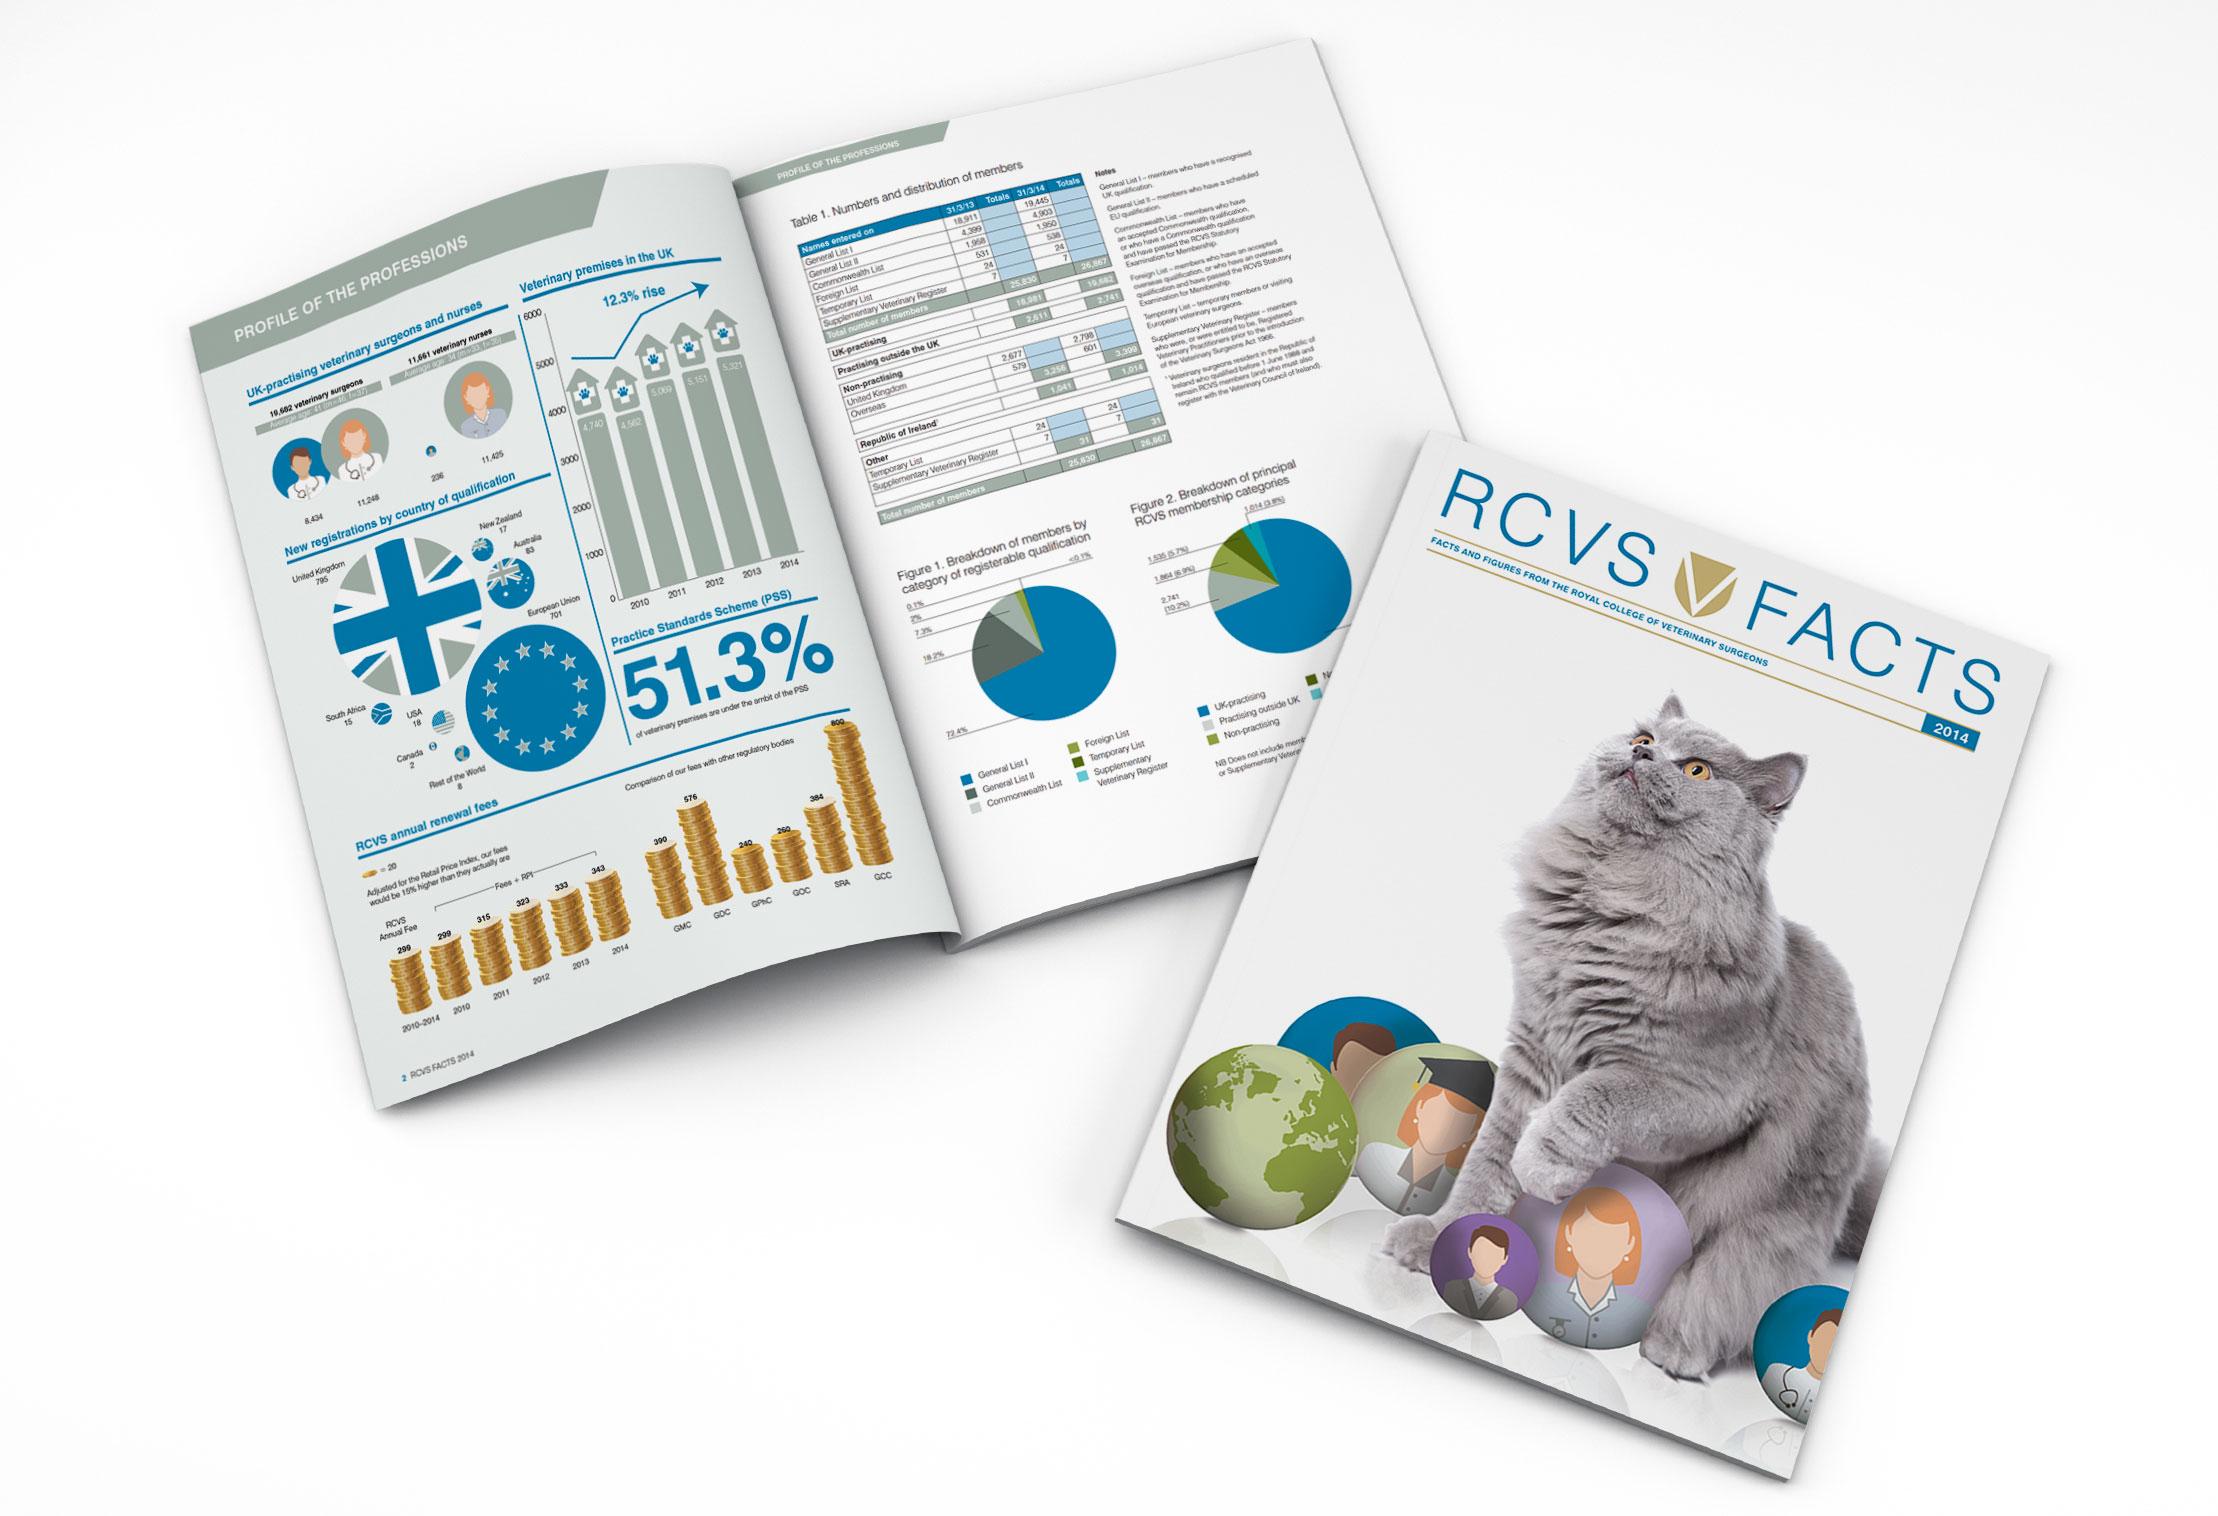 RCVS_facts